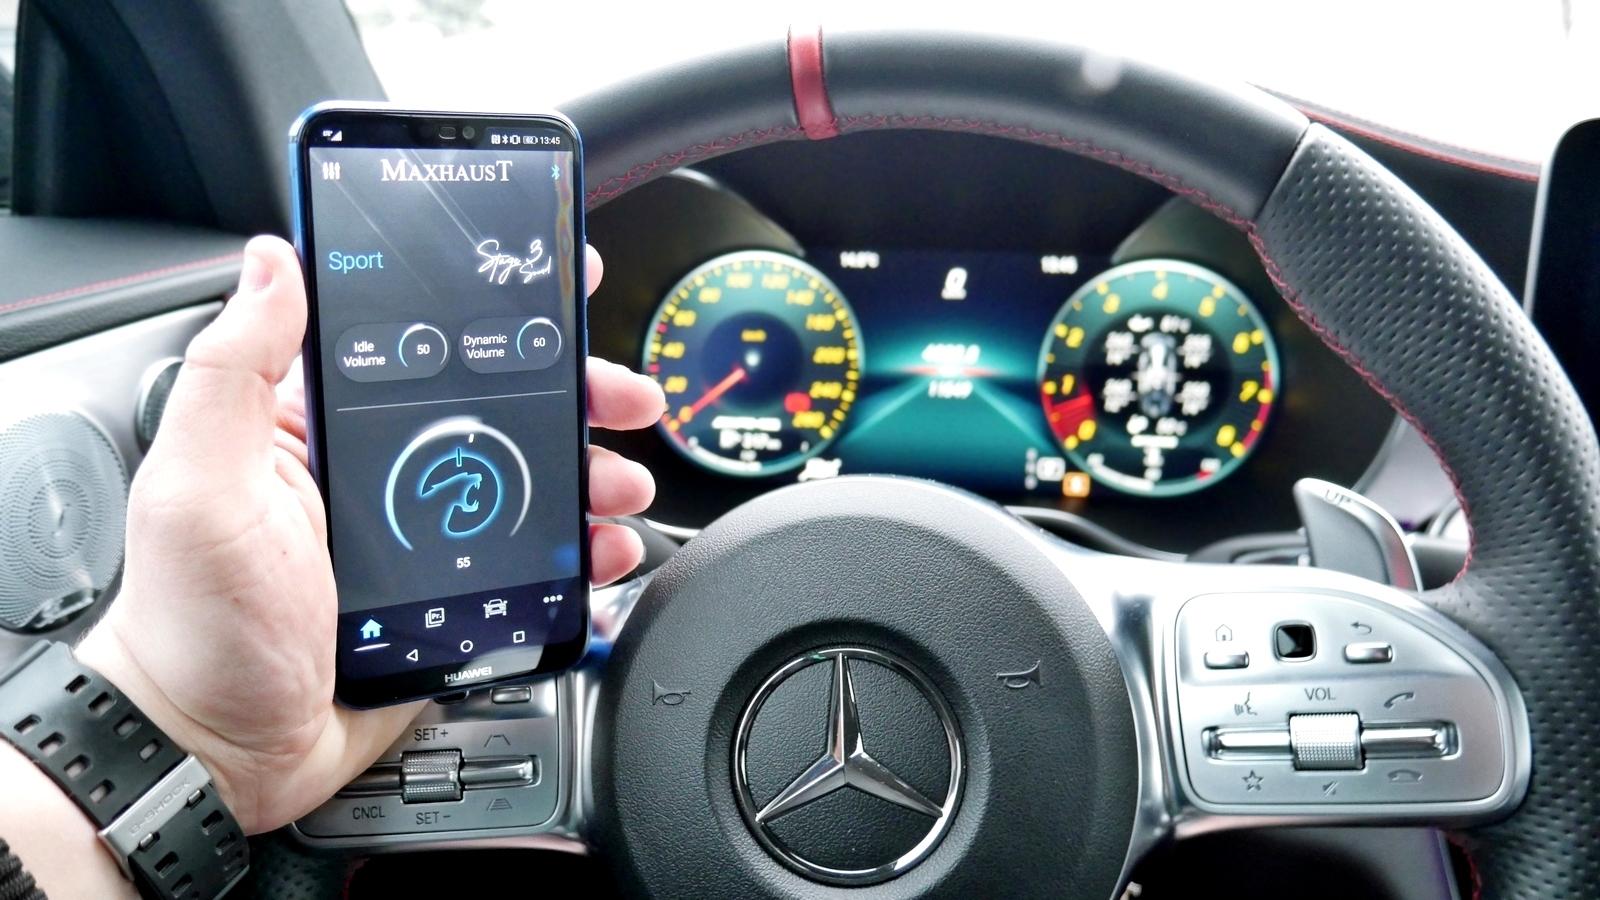 Mercedes C 43 AMG Maxhaust